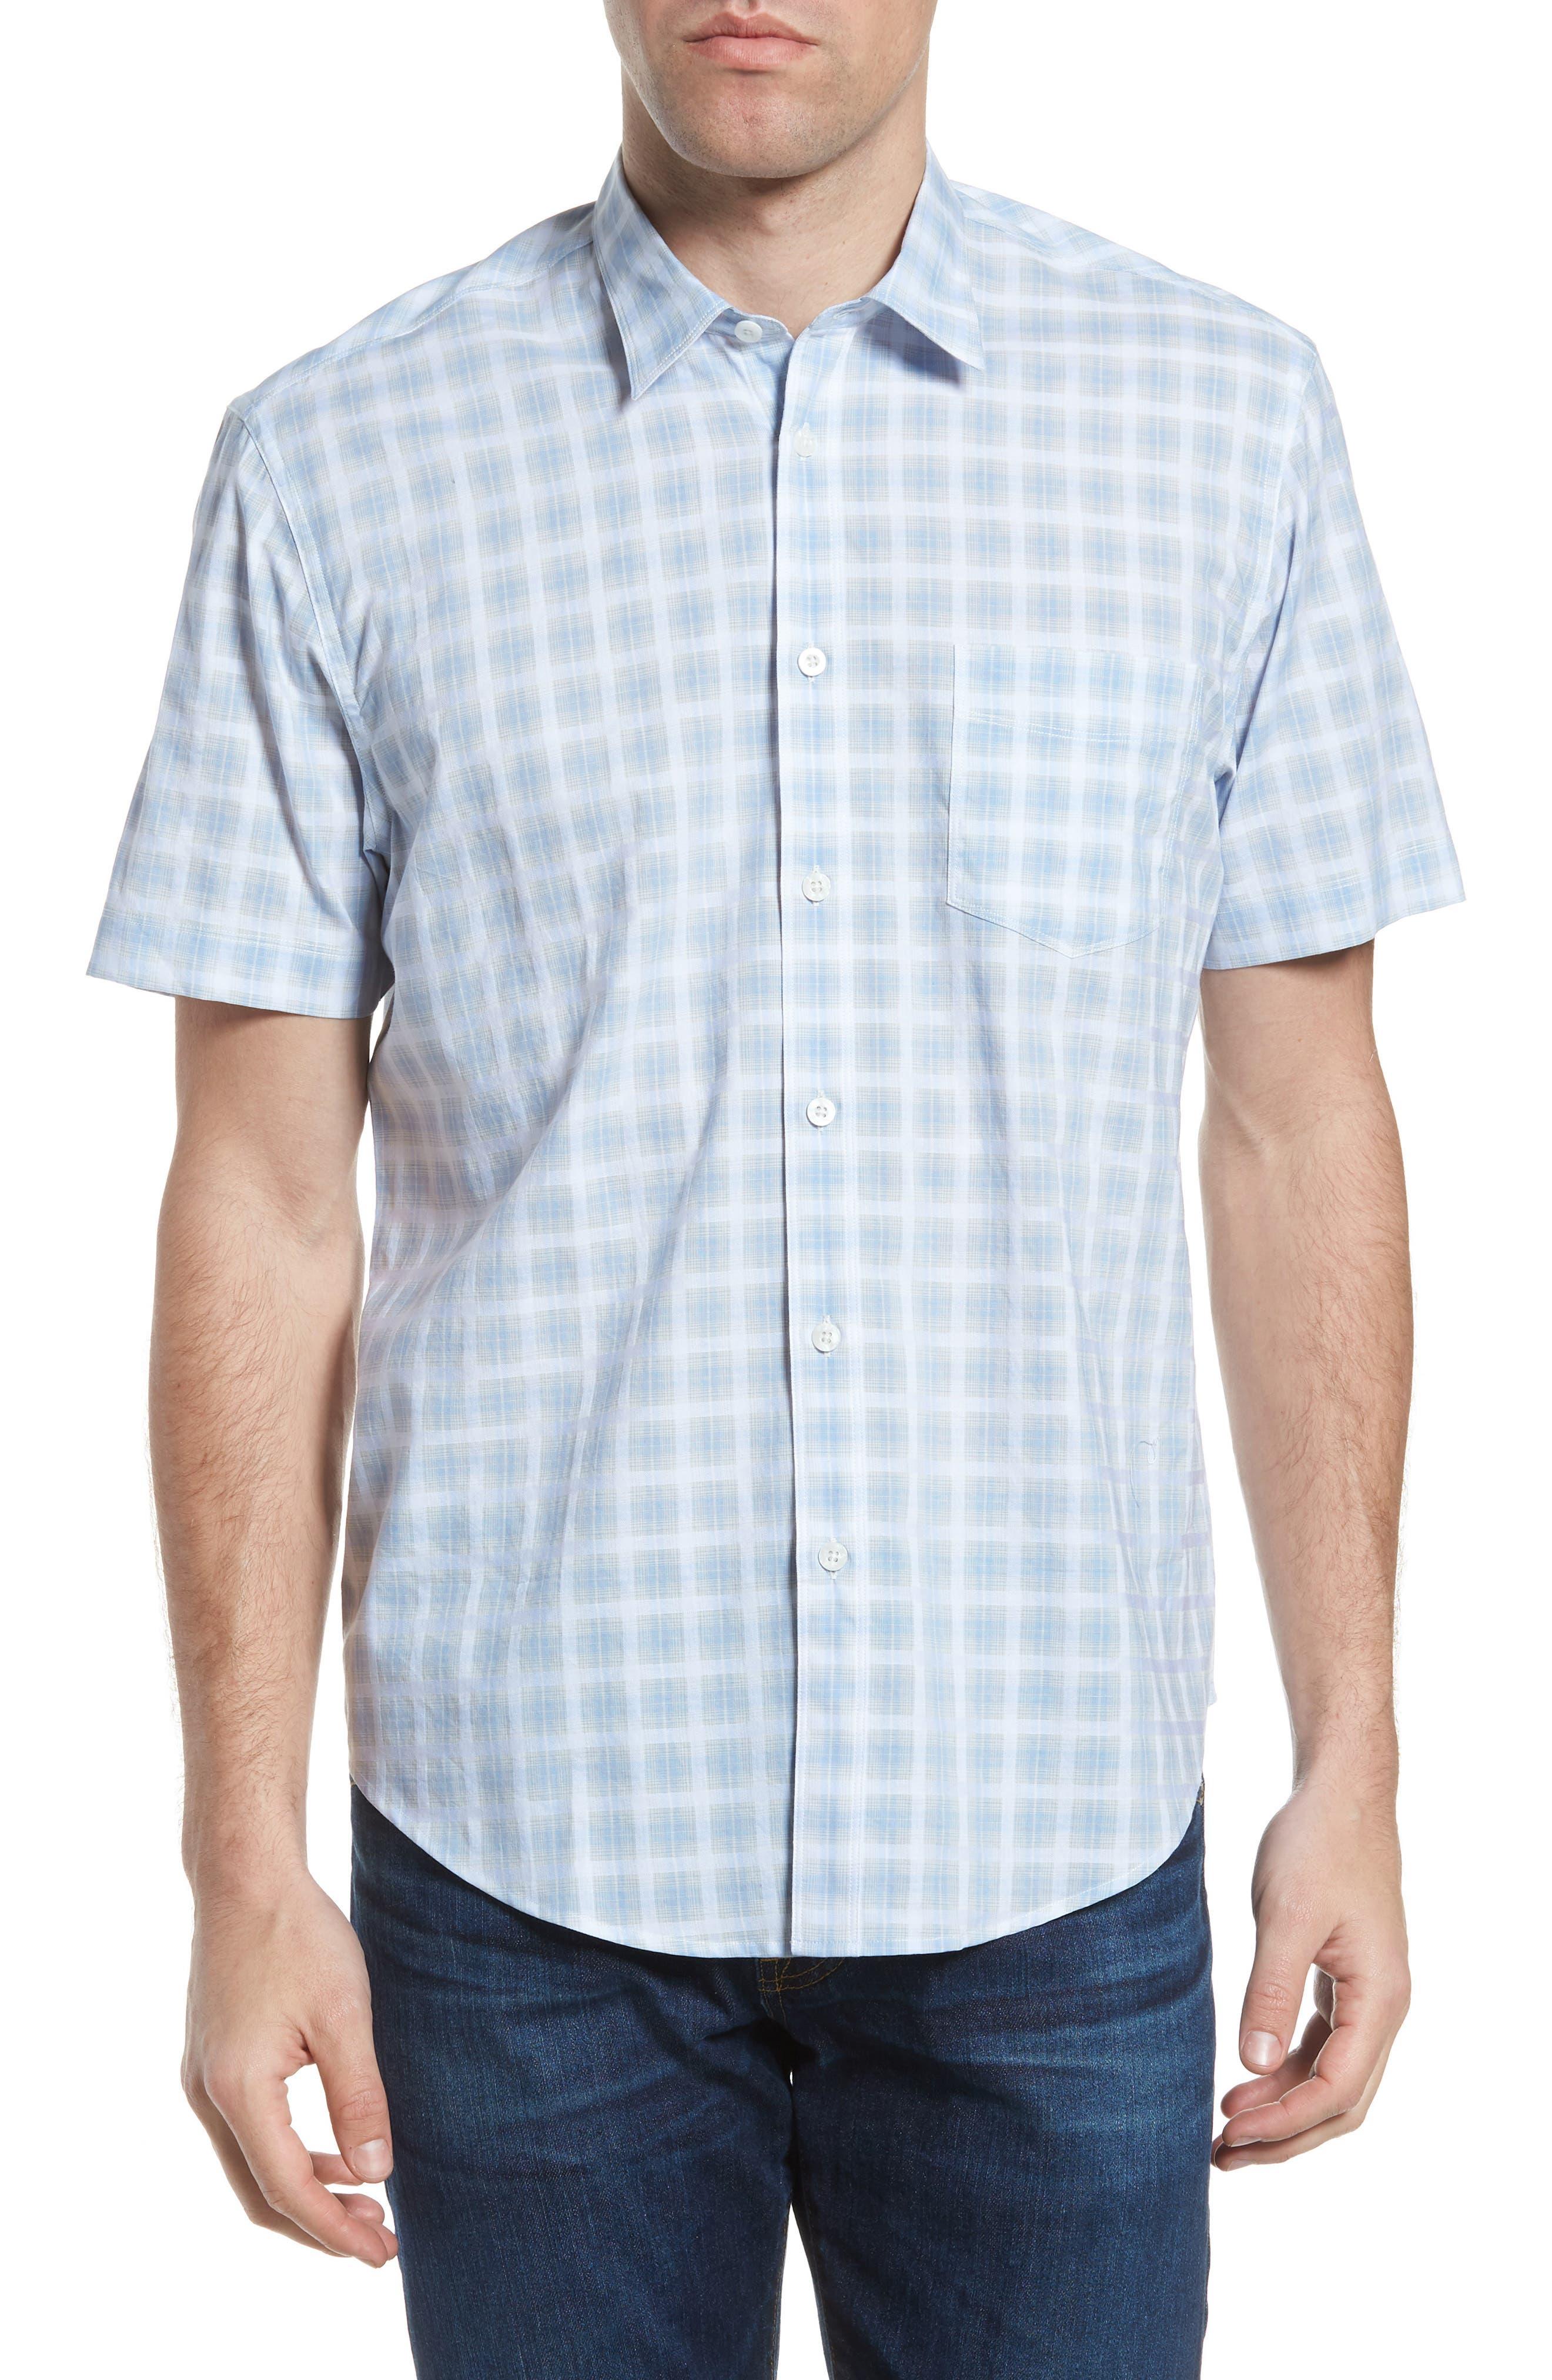 Coastaoro Ponto Regular Fit Check Sport Shirt